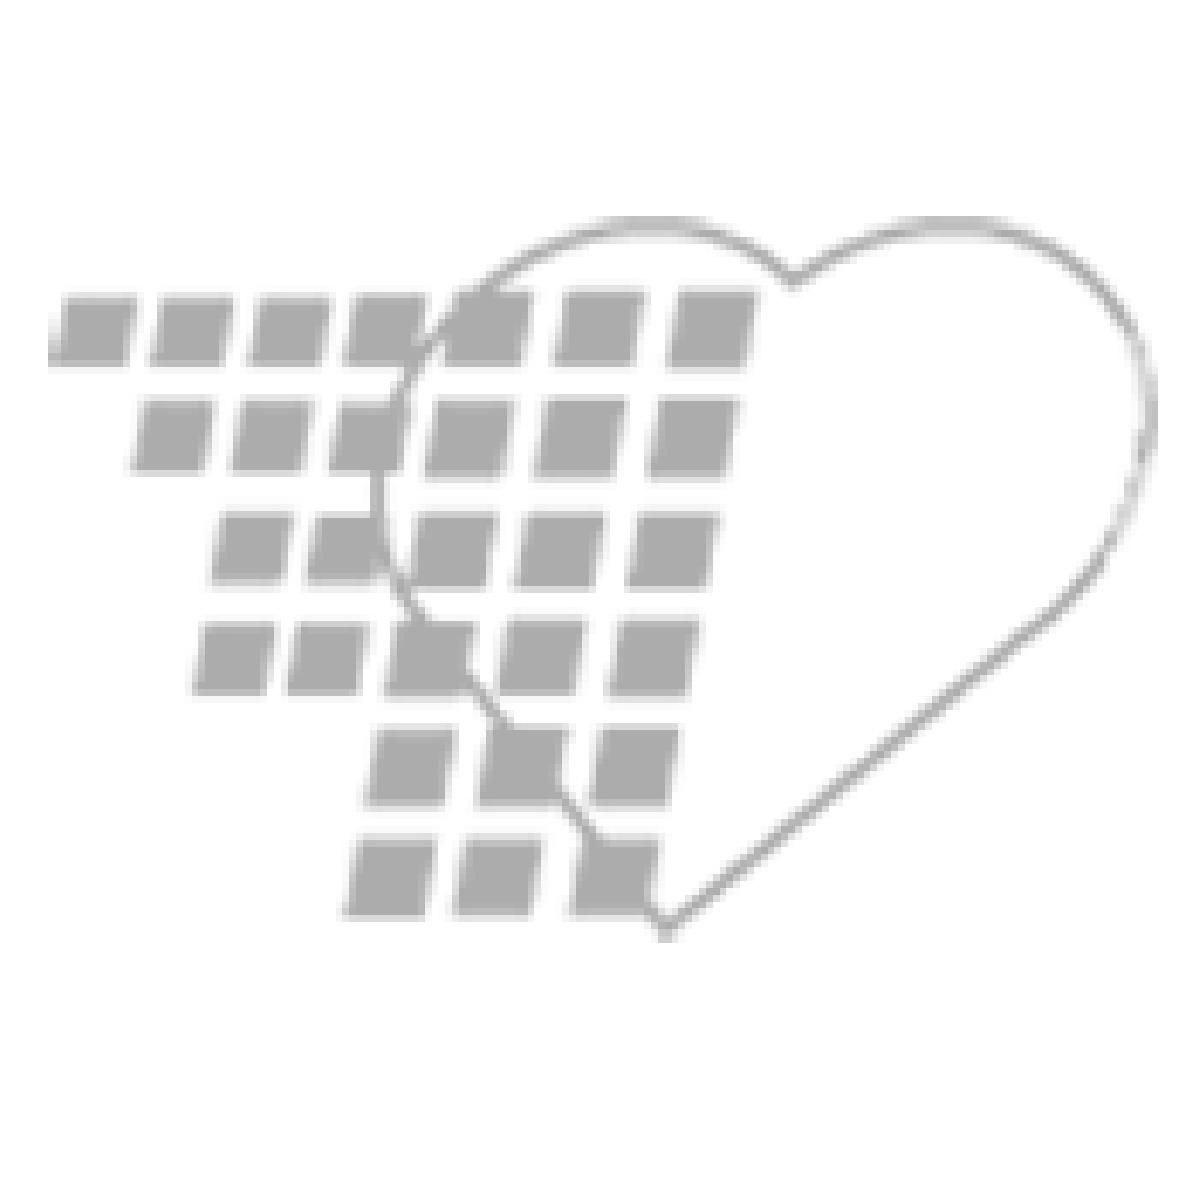 11-81-1028 Nasco Life/form® Suture Practice Arm